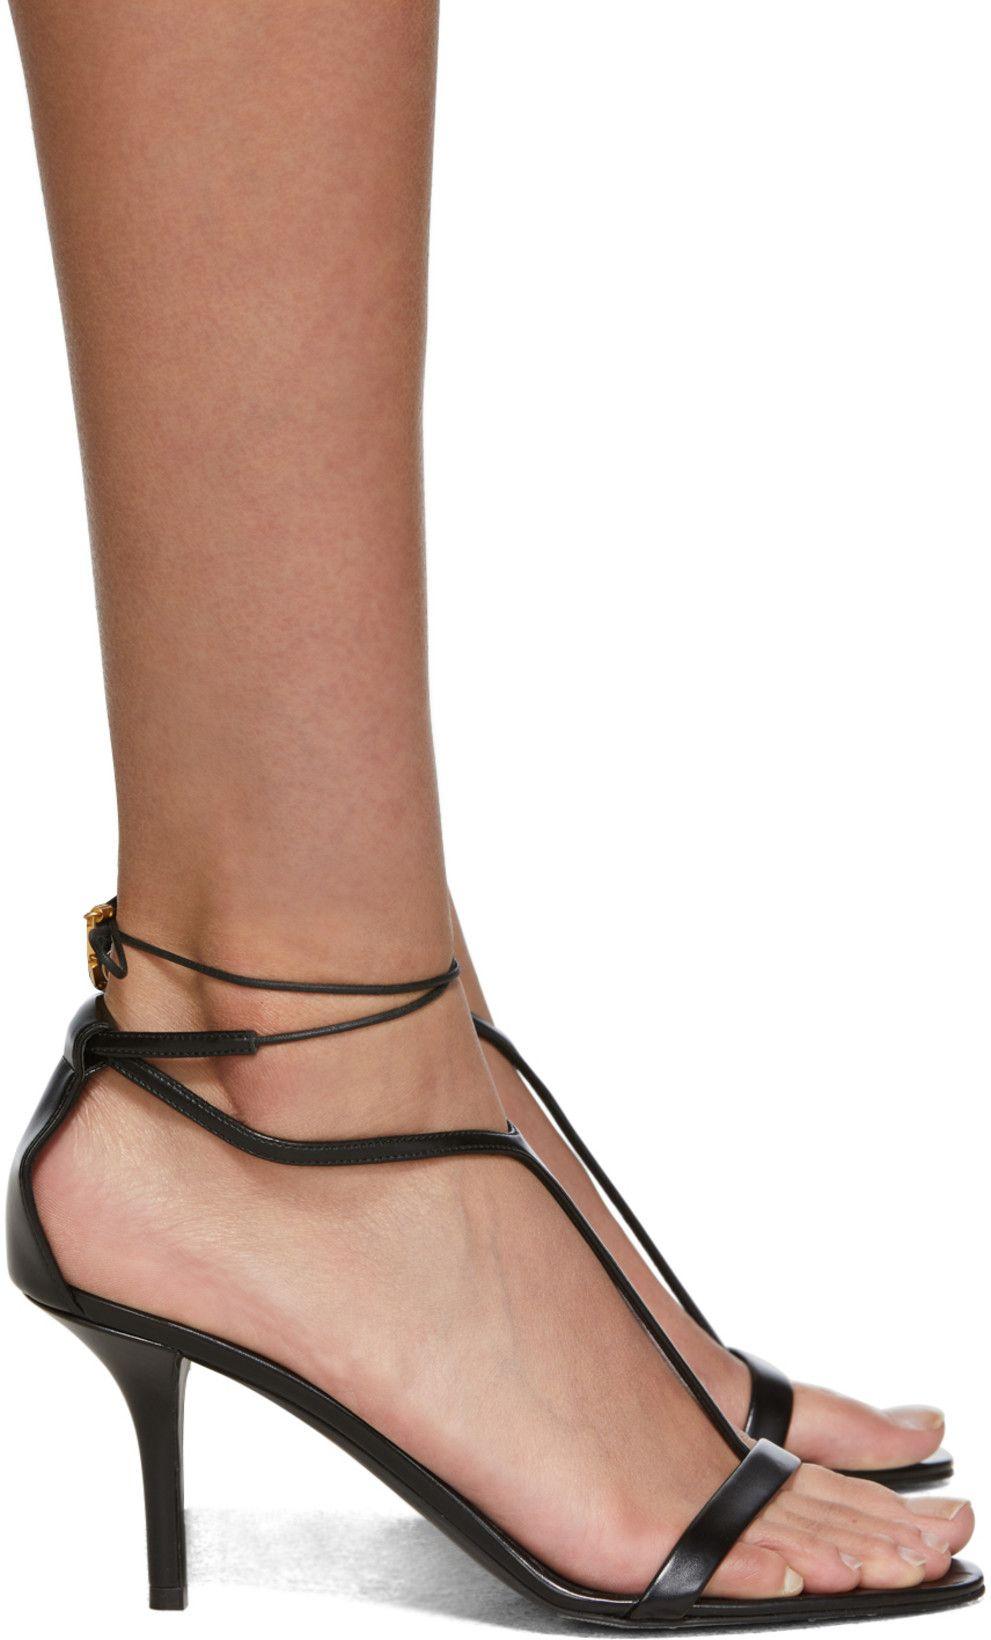 Stella Mccartney Black Strappy Sandals Ssense Canada Black